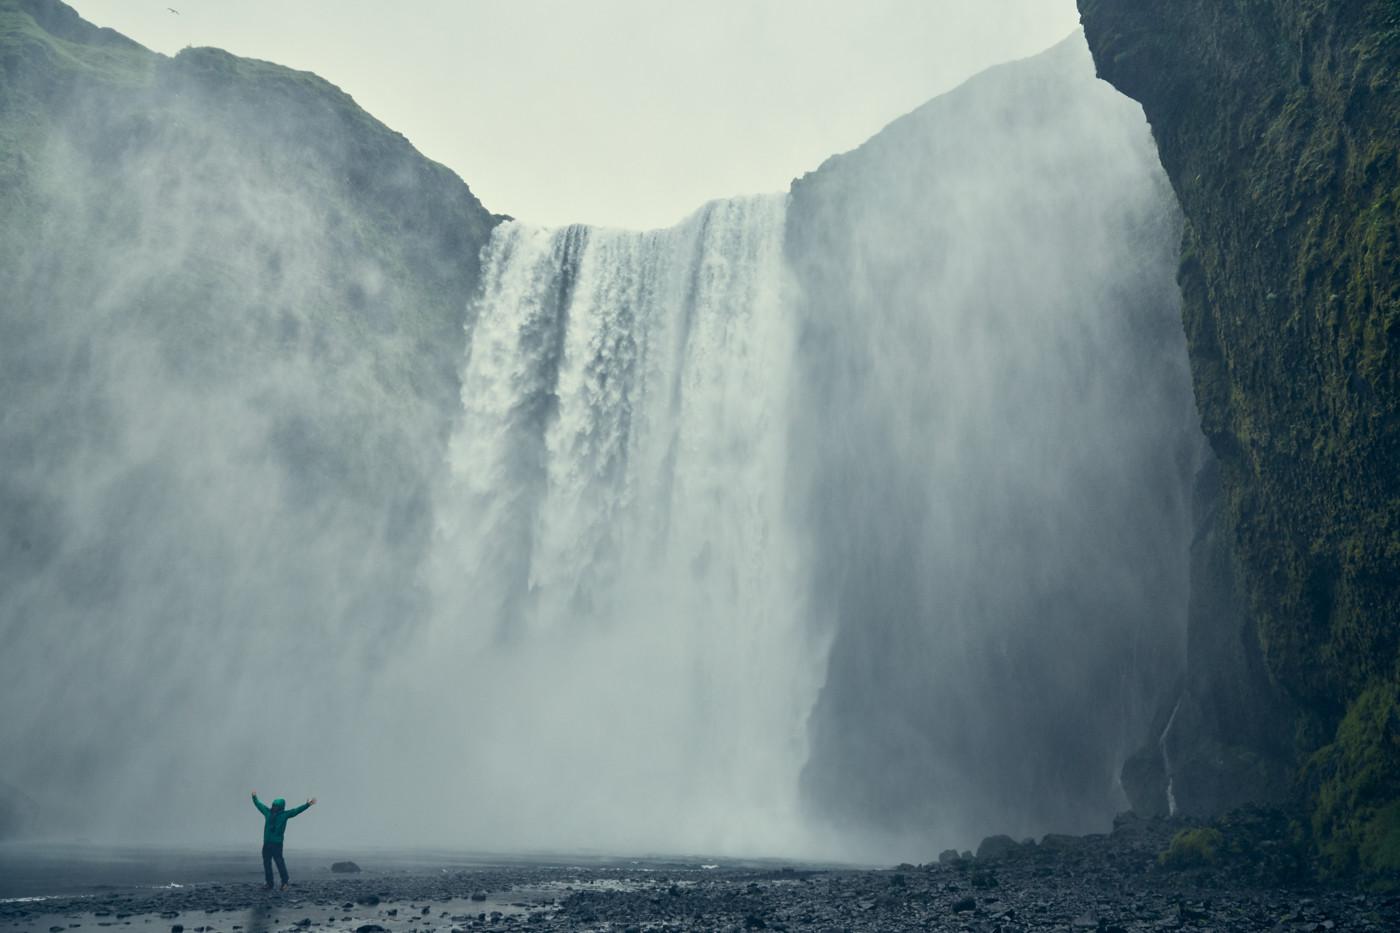 Skogafoss, Wasserfall, waterfall, Island, berühmt, famous, bucketlist, gigantisch, groß, viele Touristen, Roadtrip, Rundreise, Miles and Shores, Reiseblog, Reiseblogger, Travelblogger, tosend, must see things, gigantisch, huge,